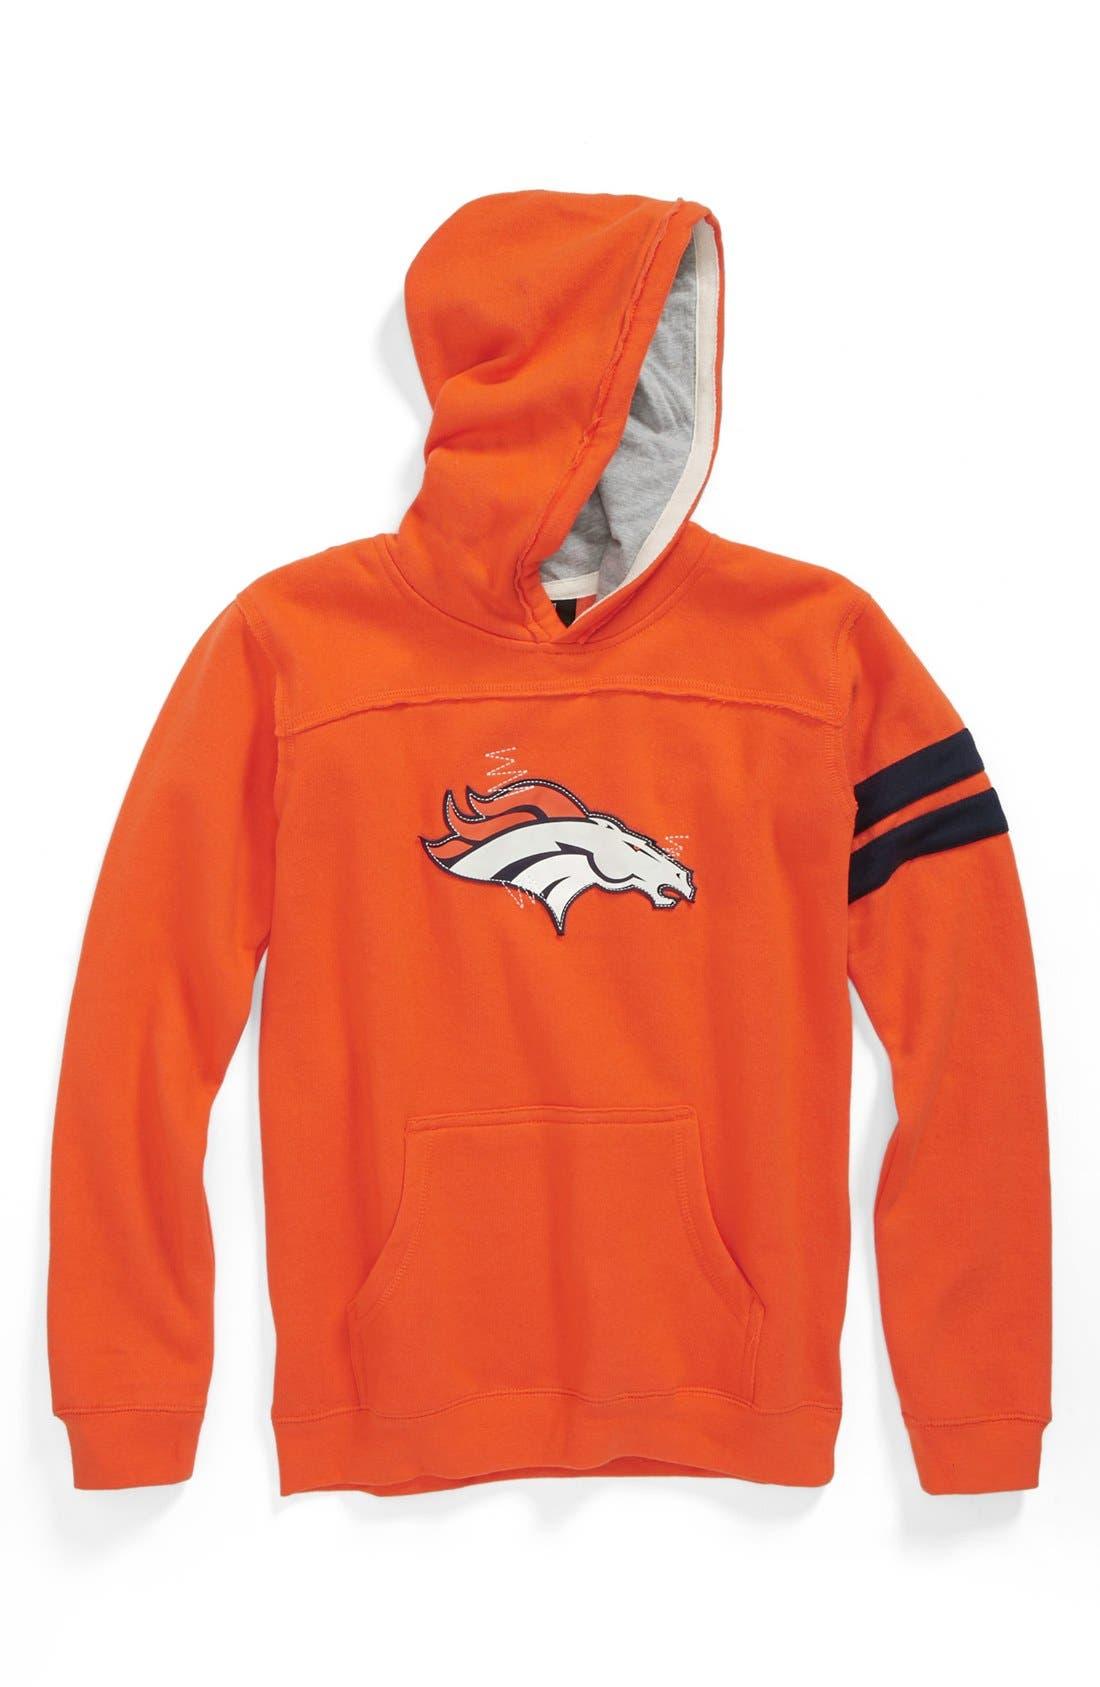 Alternate Image 1 Selected - Outerstuff 'Denver Broncos' Hoodie (Big Boys)